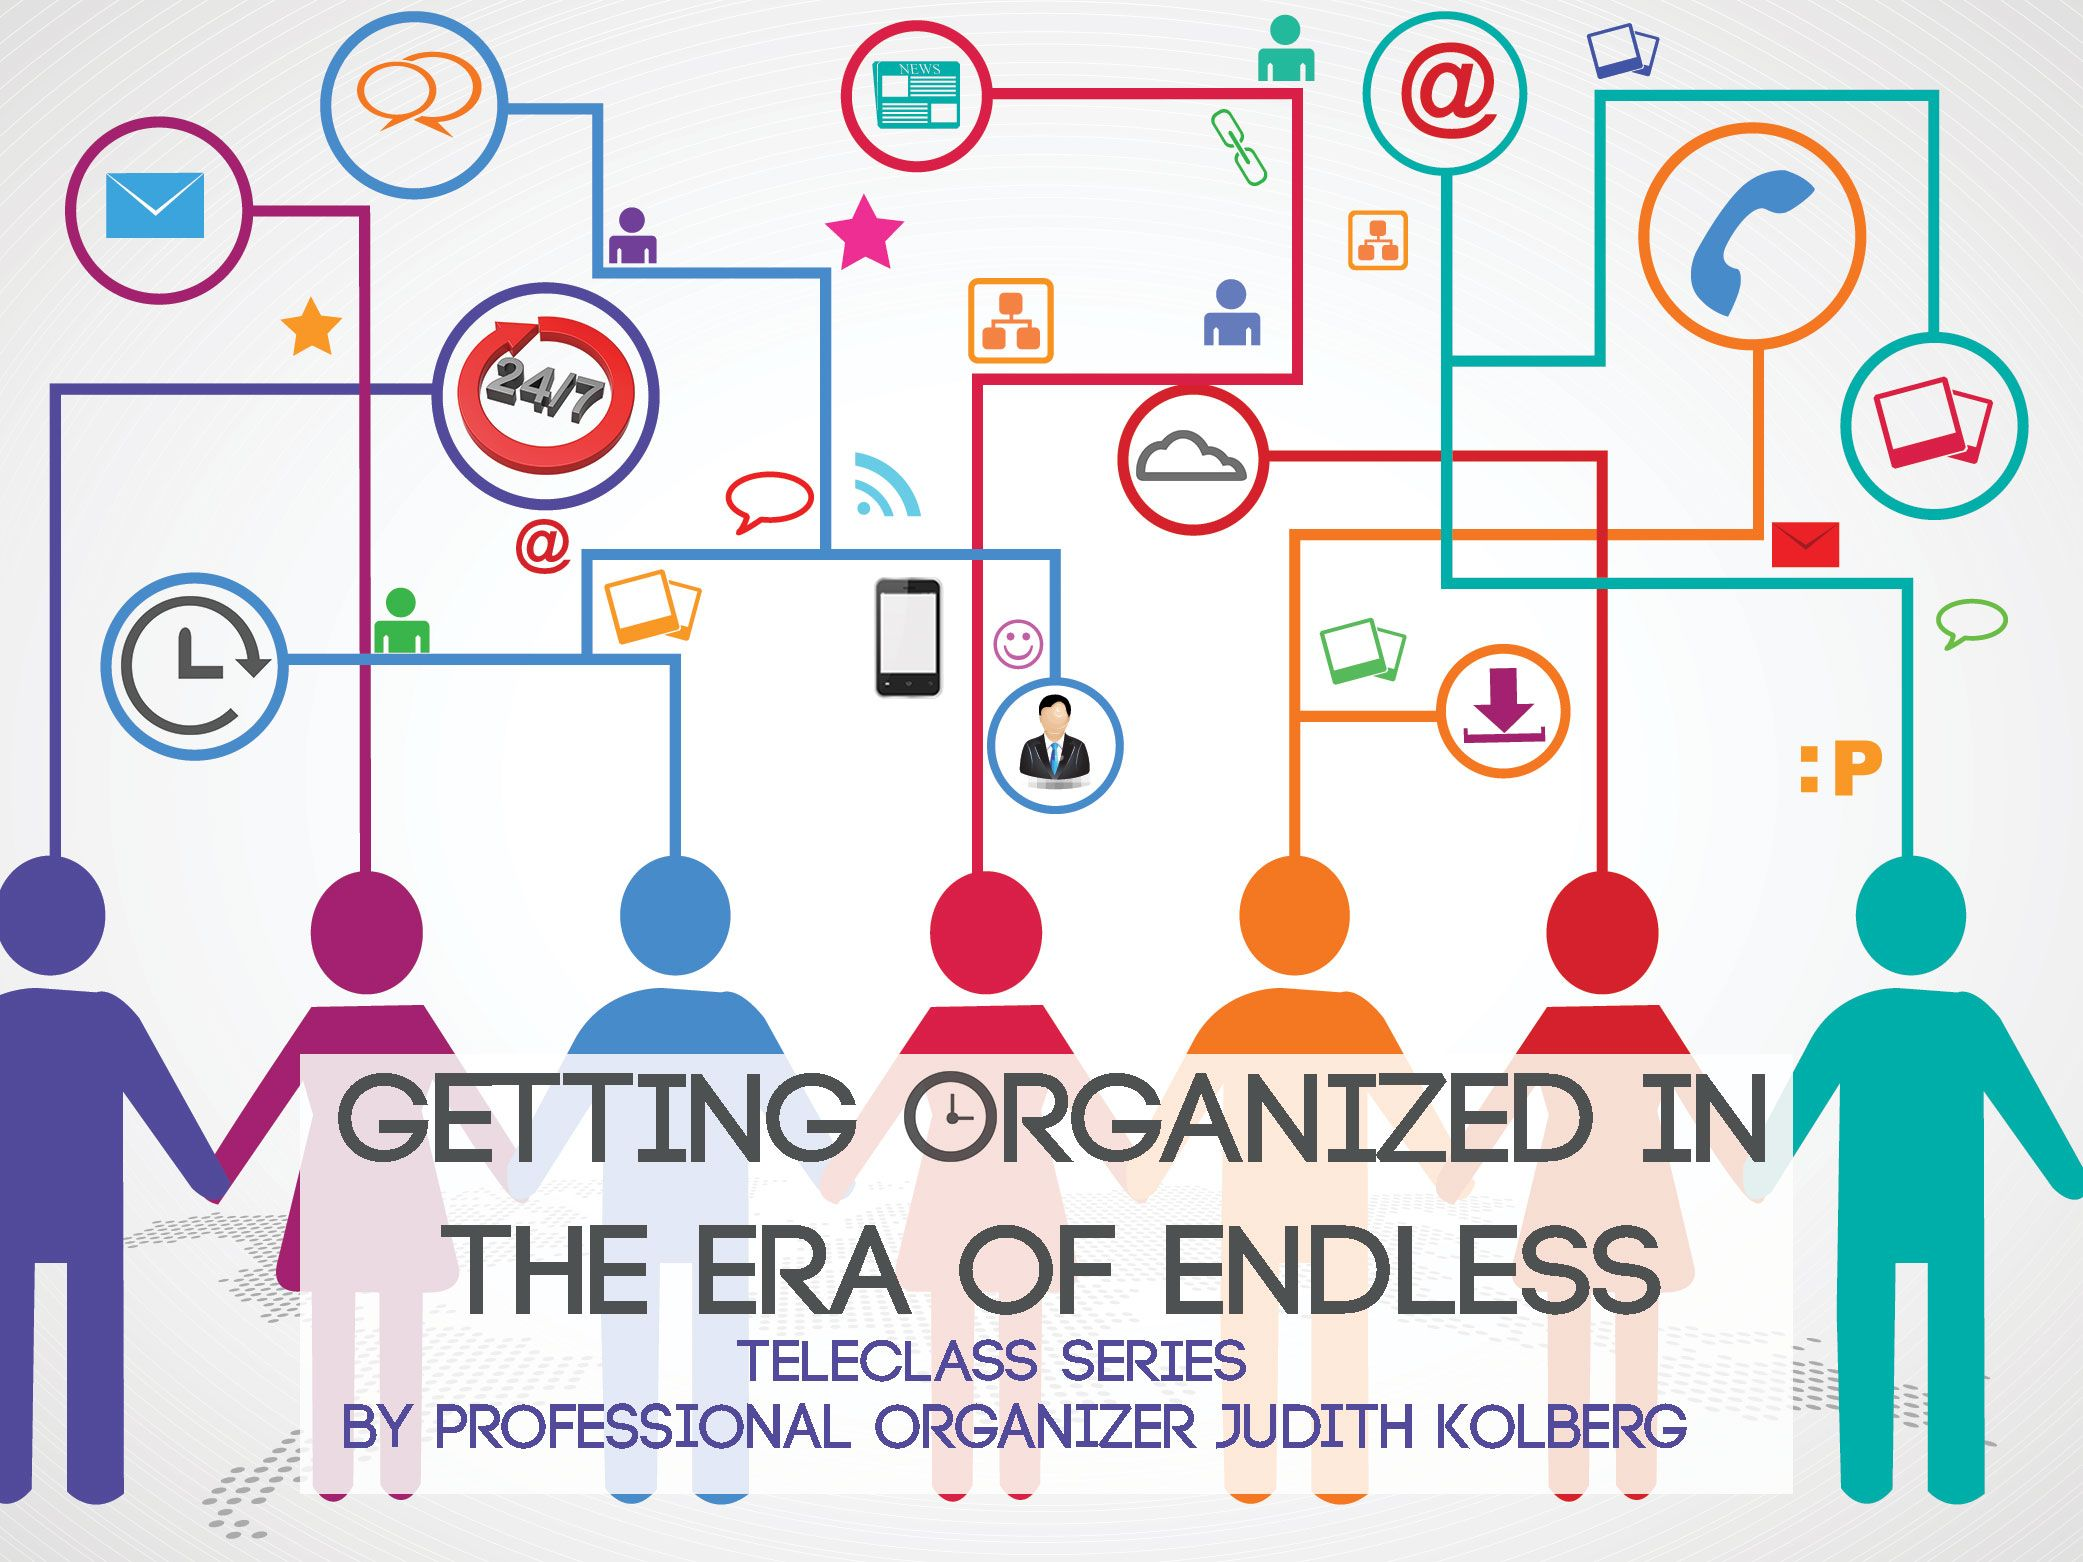 Pin by Christina Reddish on Organizing ideas group board ...